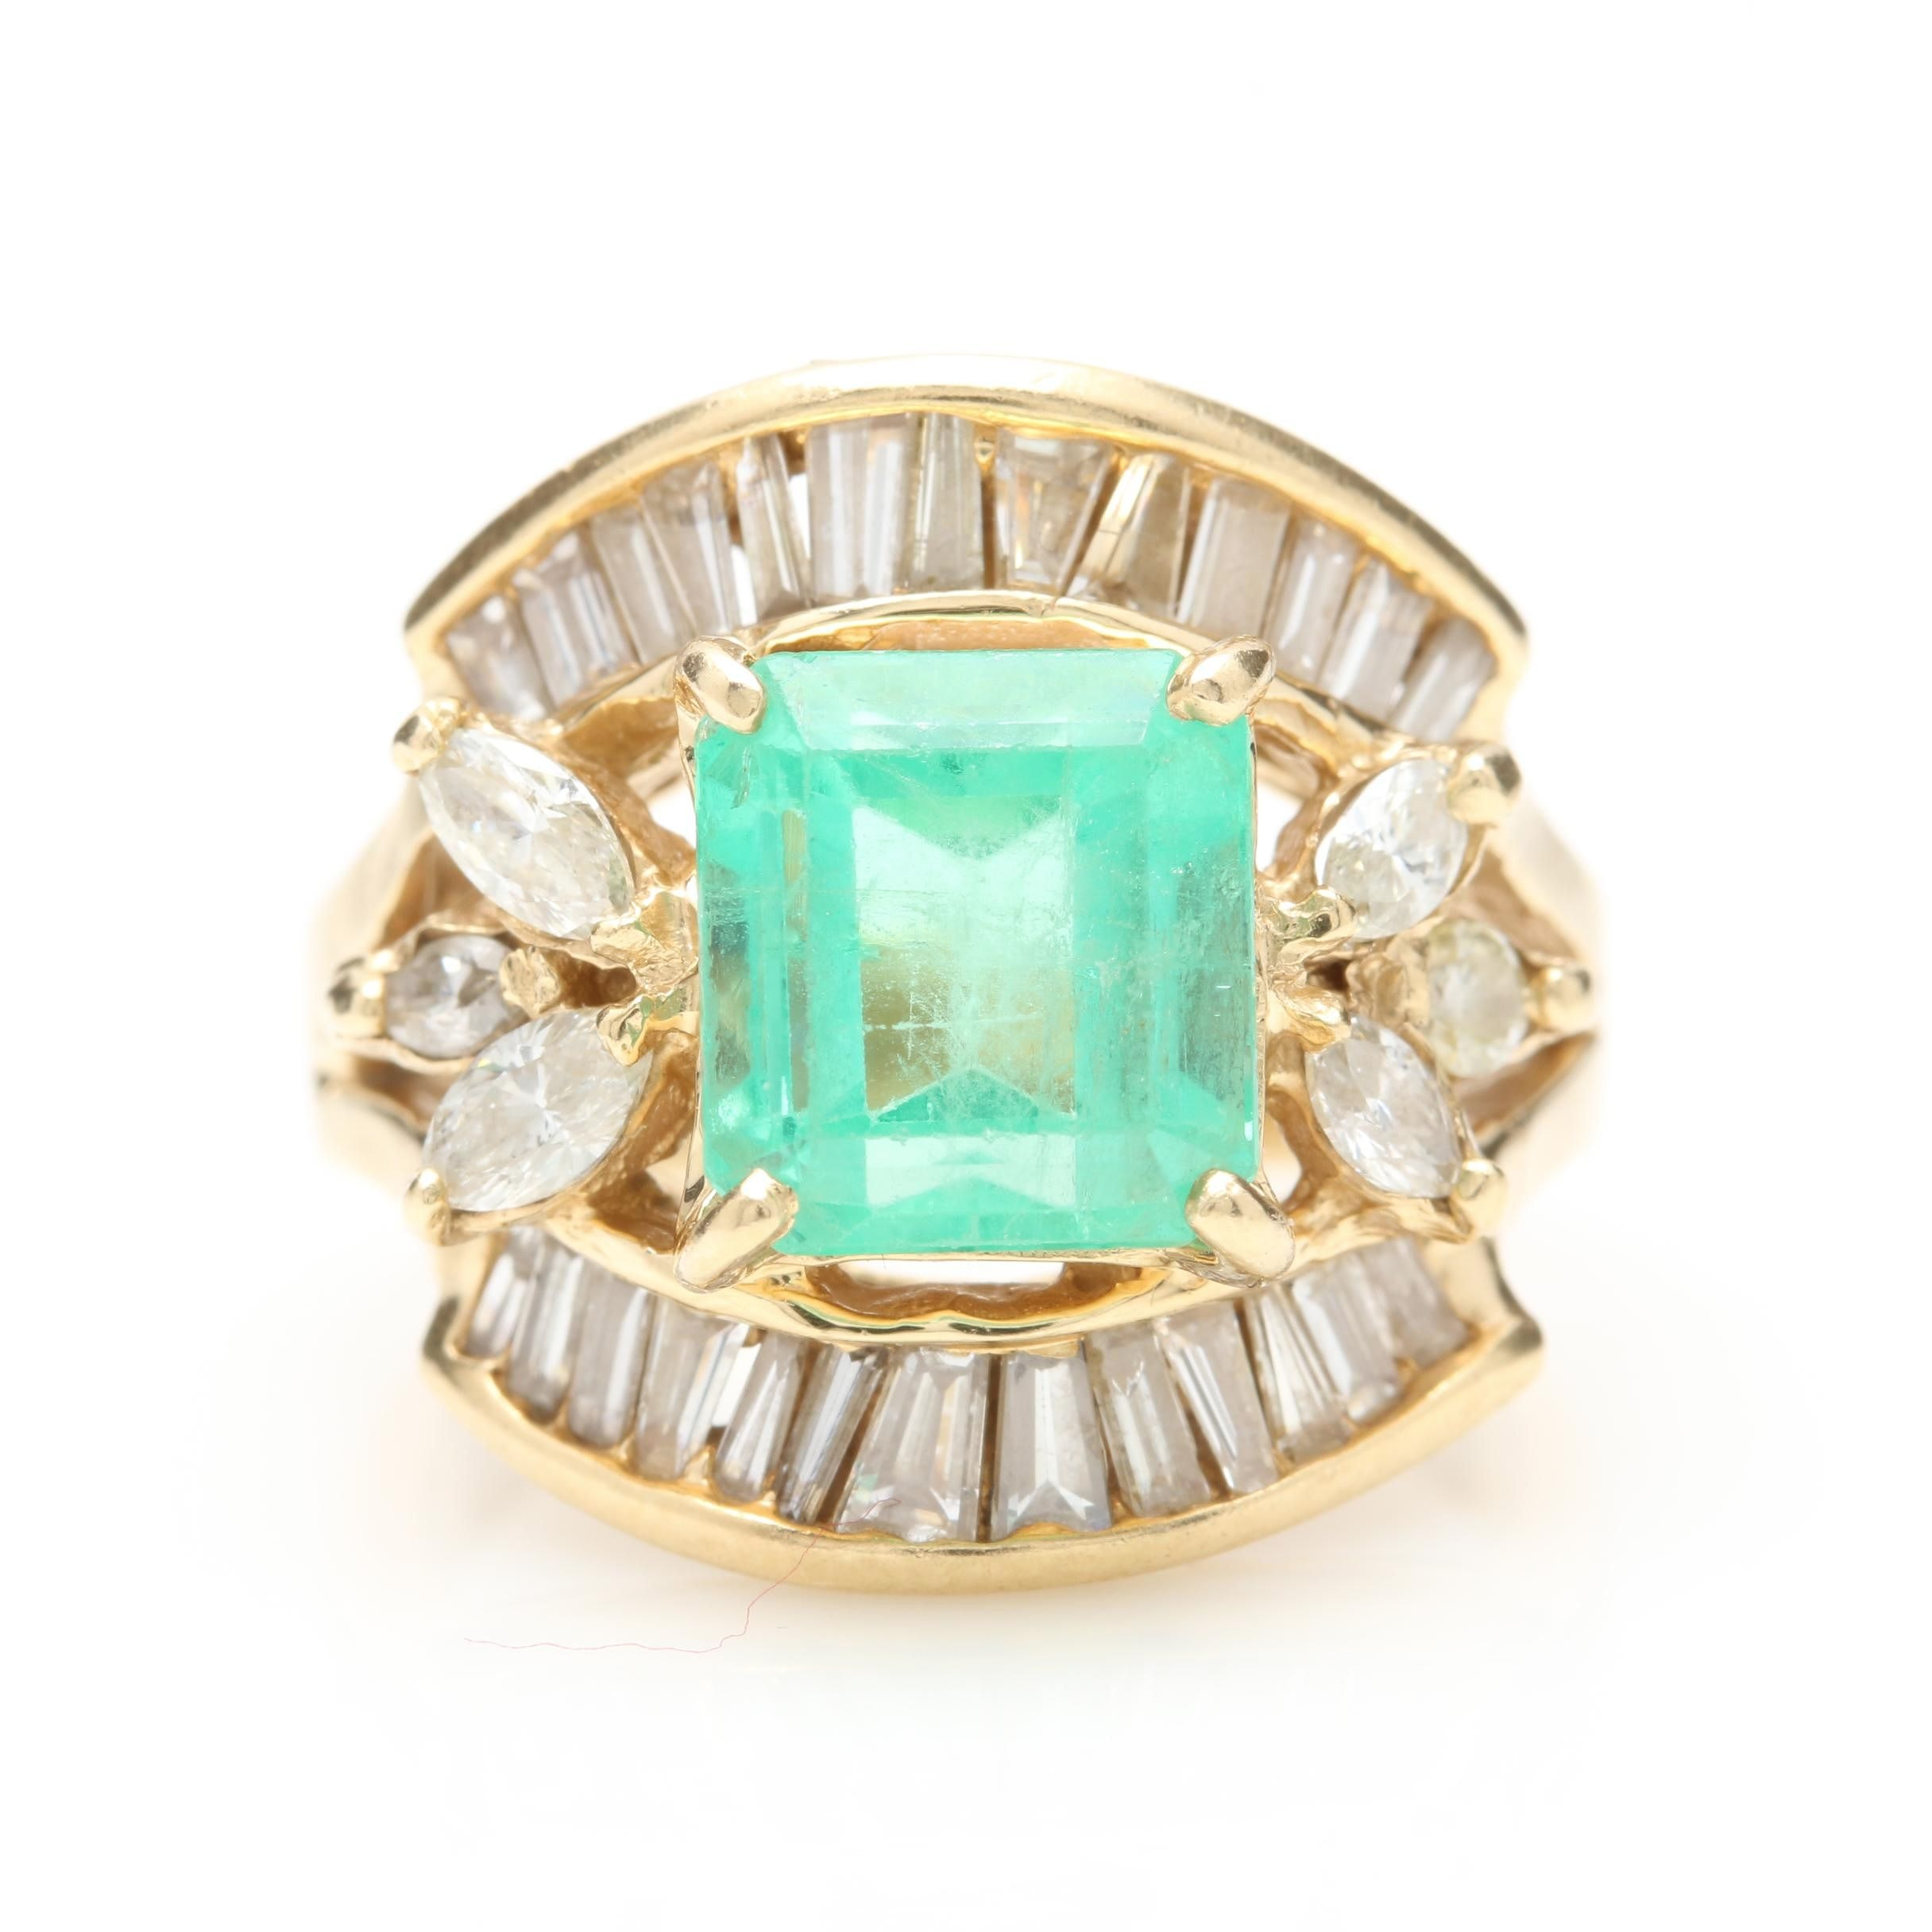 14K Yellow Gold 3.04 CT Emerald and 1.72 CTW Diamond Ring